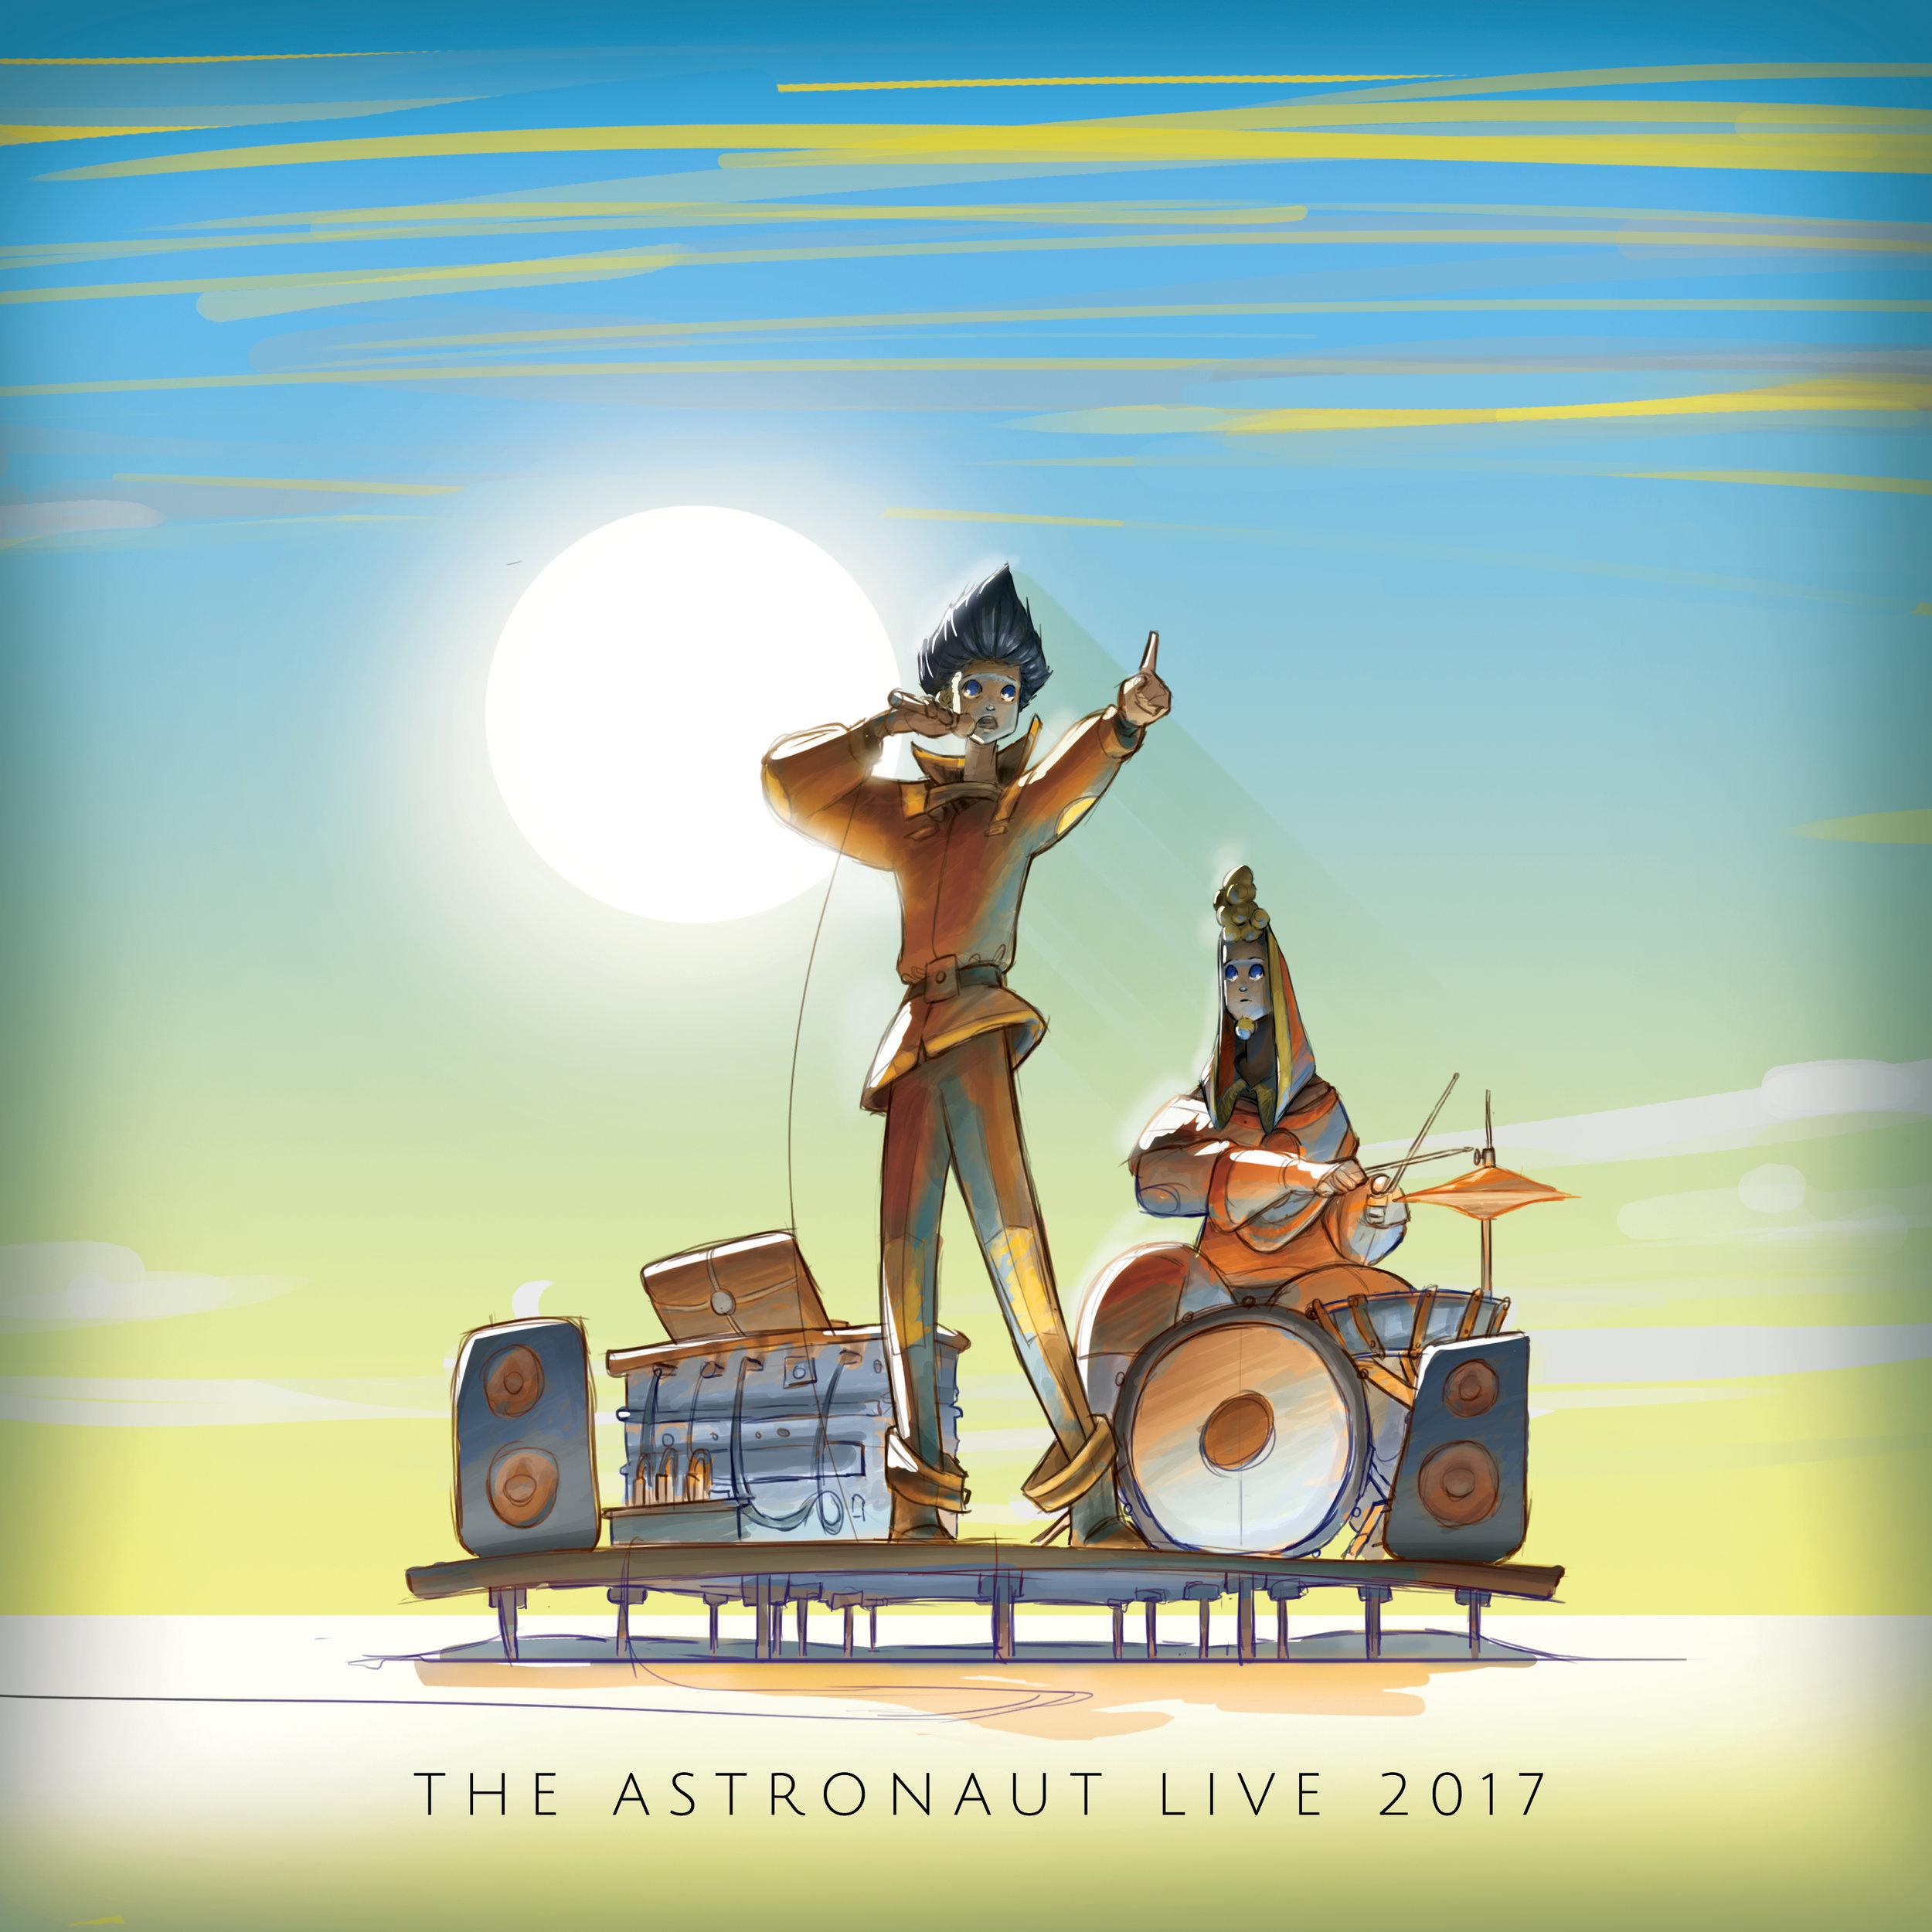 The Astronaut Live 2017 3000px.jpeg